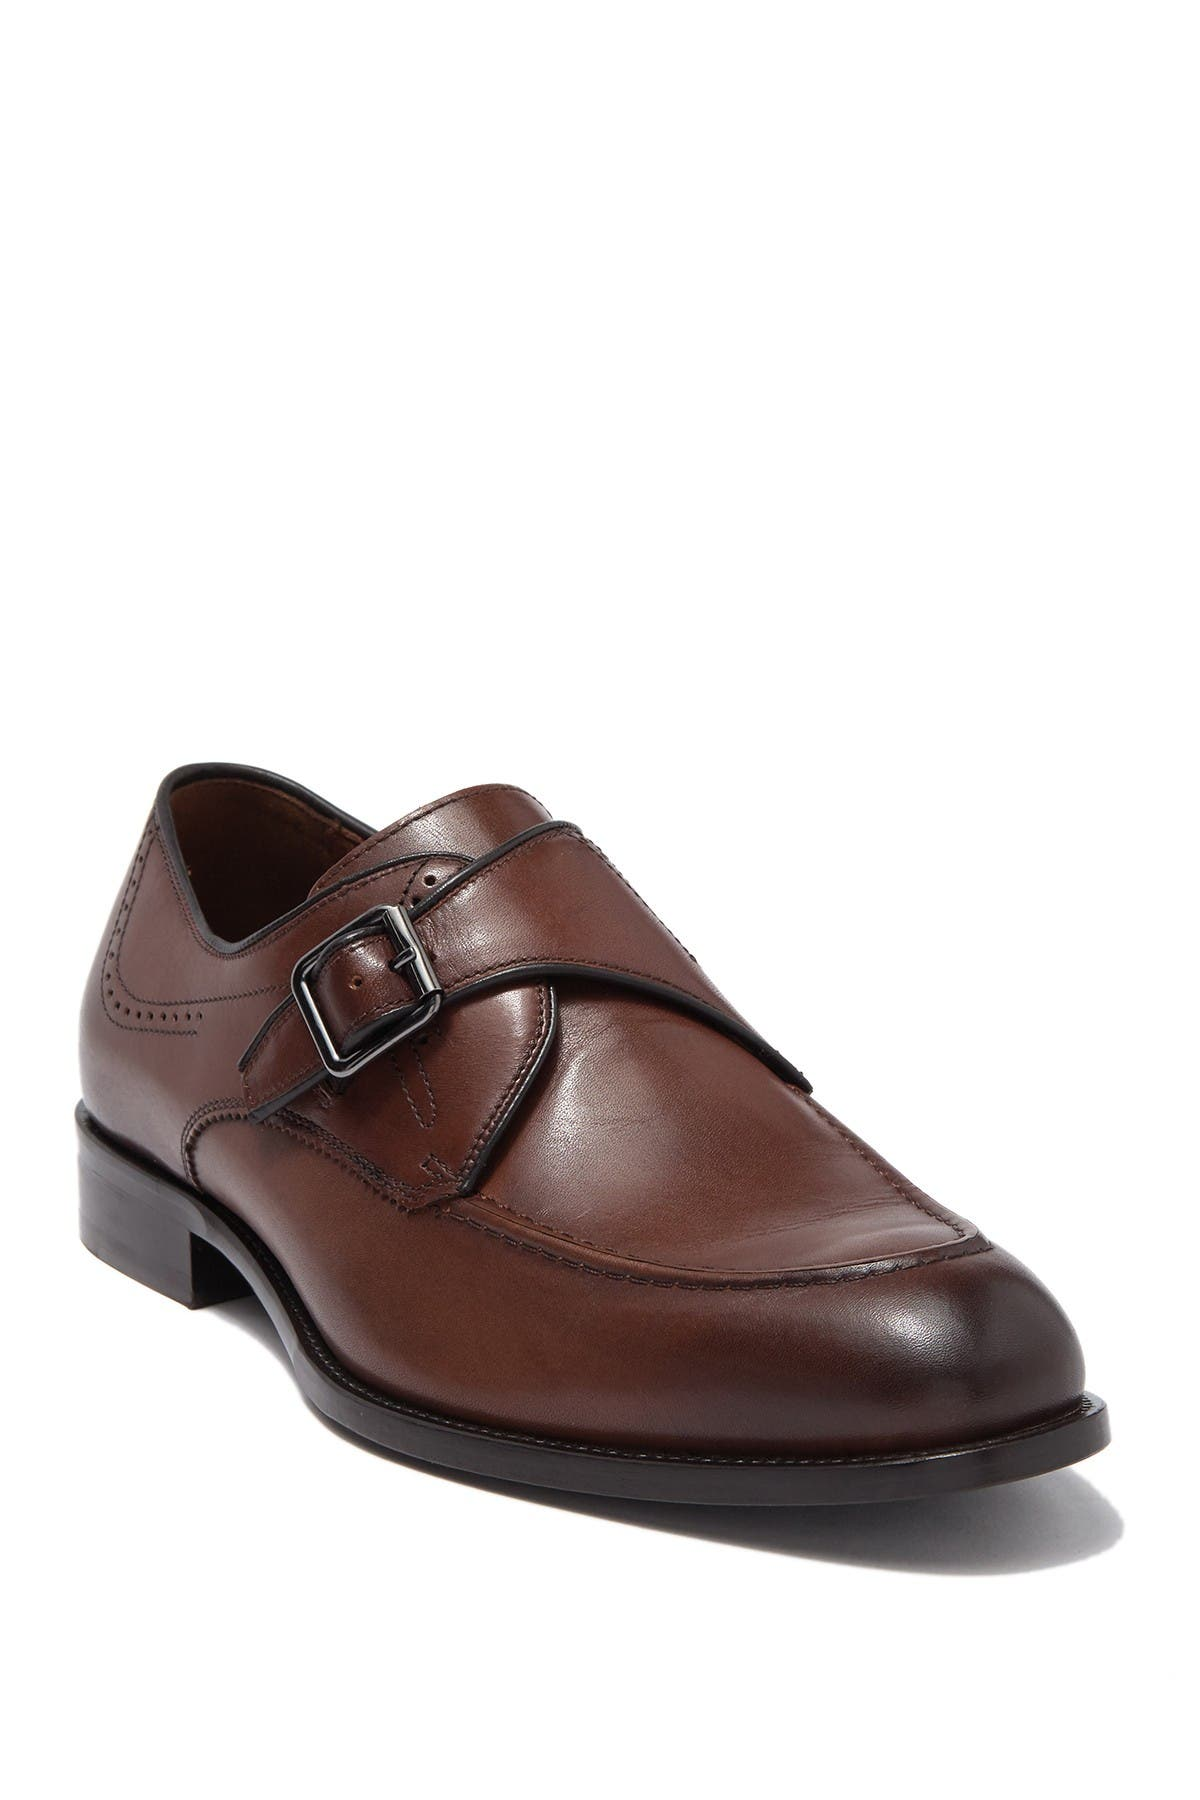 Image of Johnston & Murphy Evanston Monk Strap Shoe